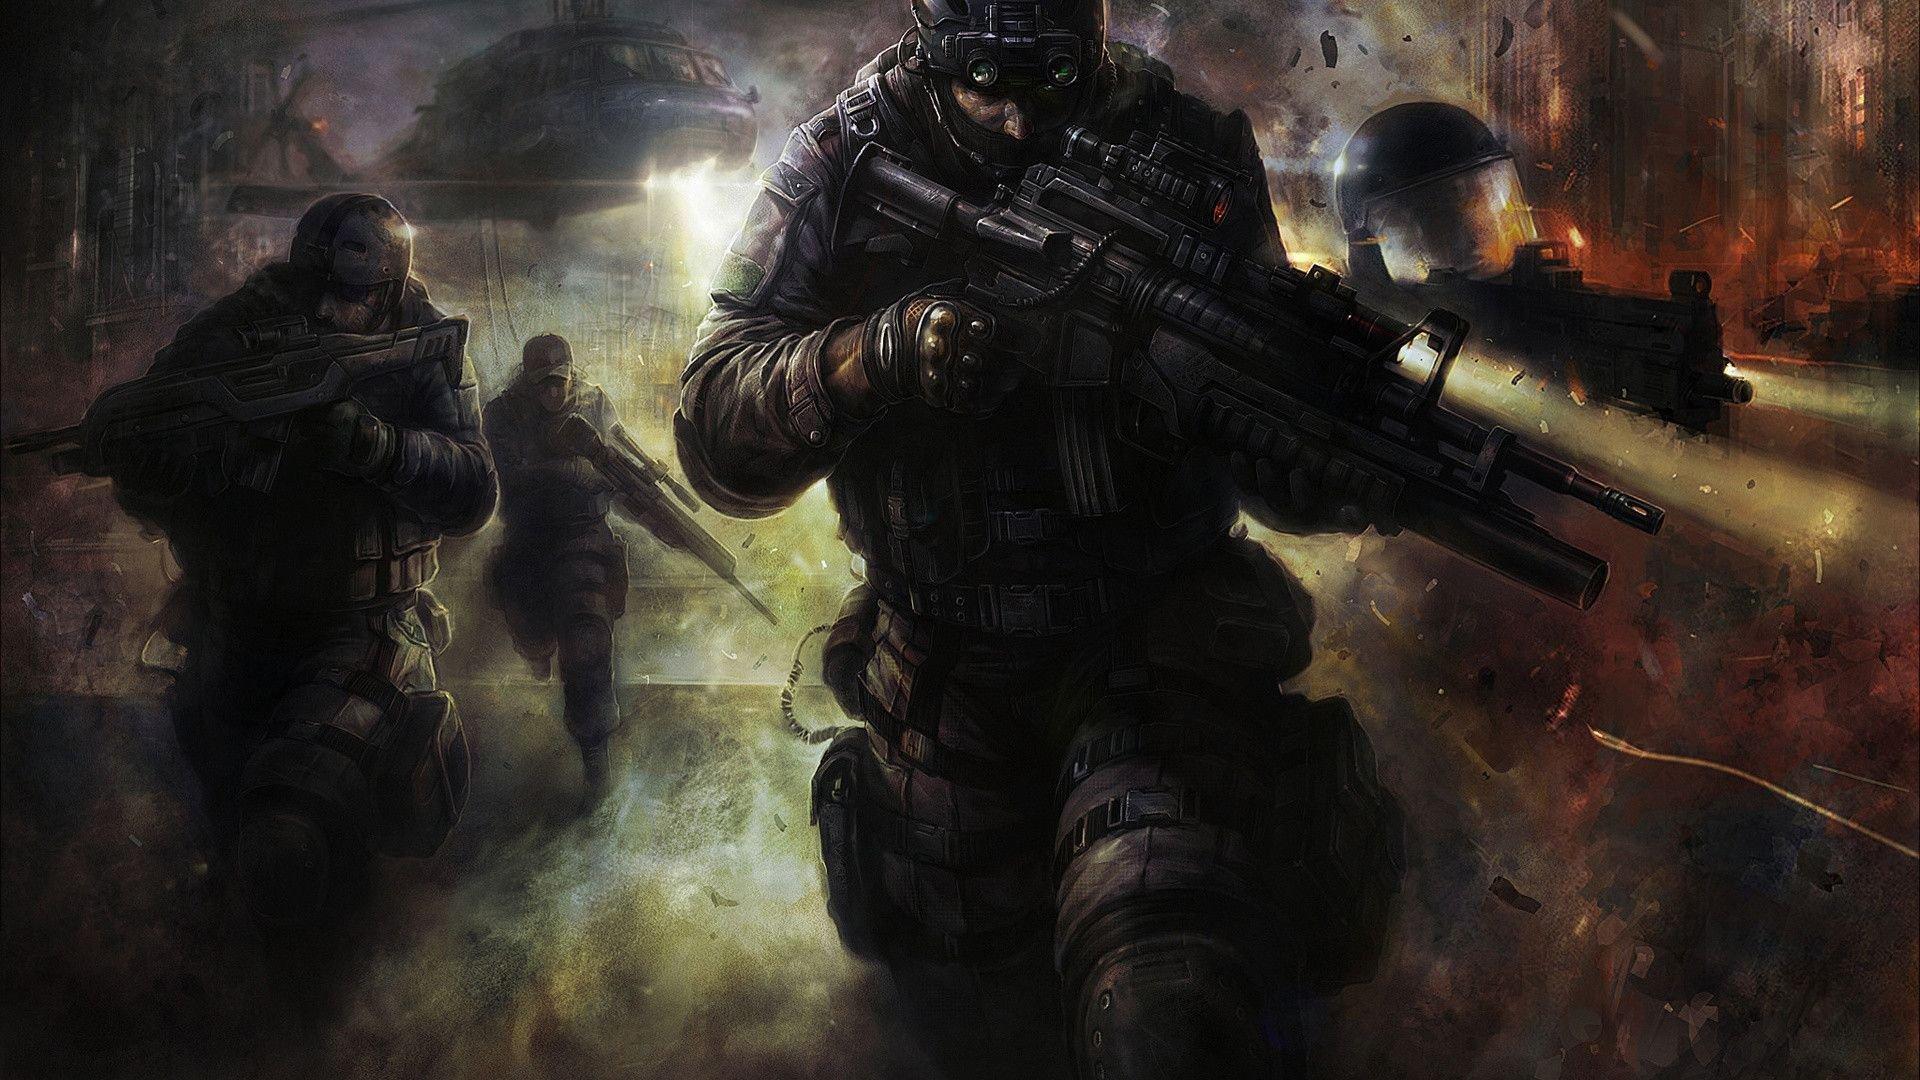 Halo Reach 3d Wallpaper Pc Swat Hd Wallpaper Background Image 1920x1080 Id